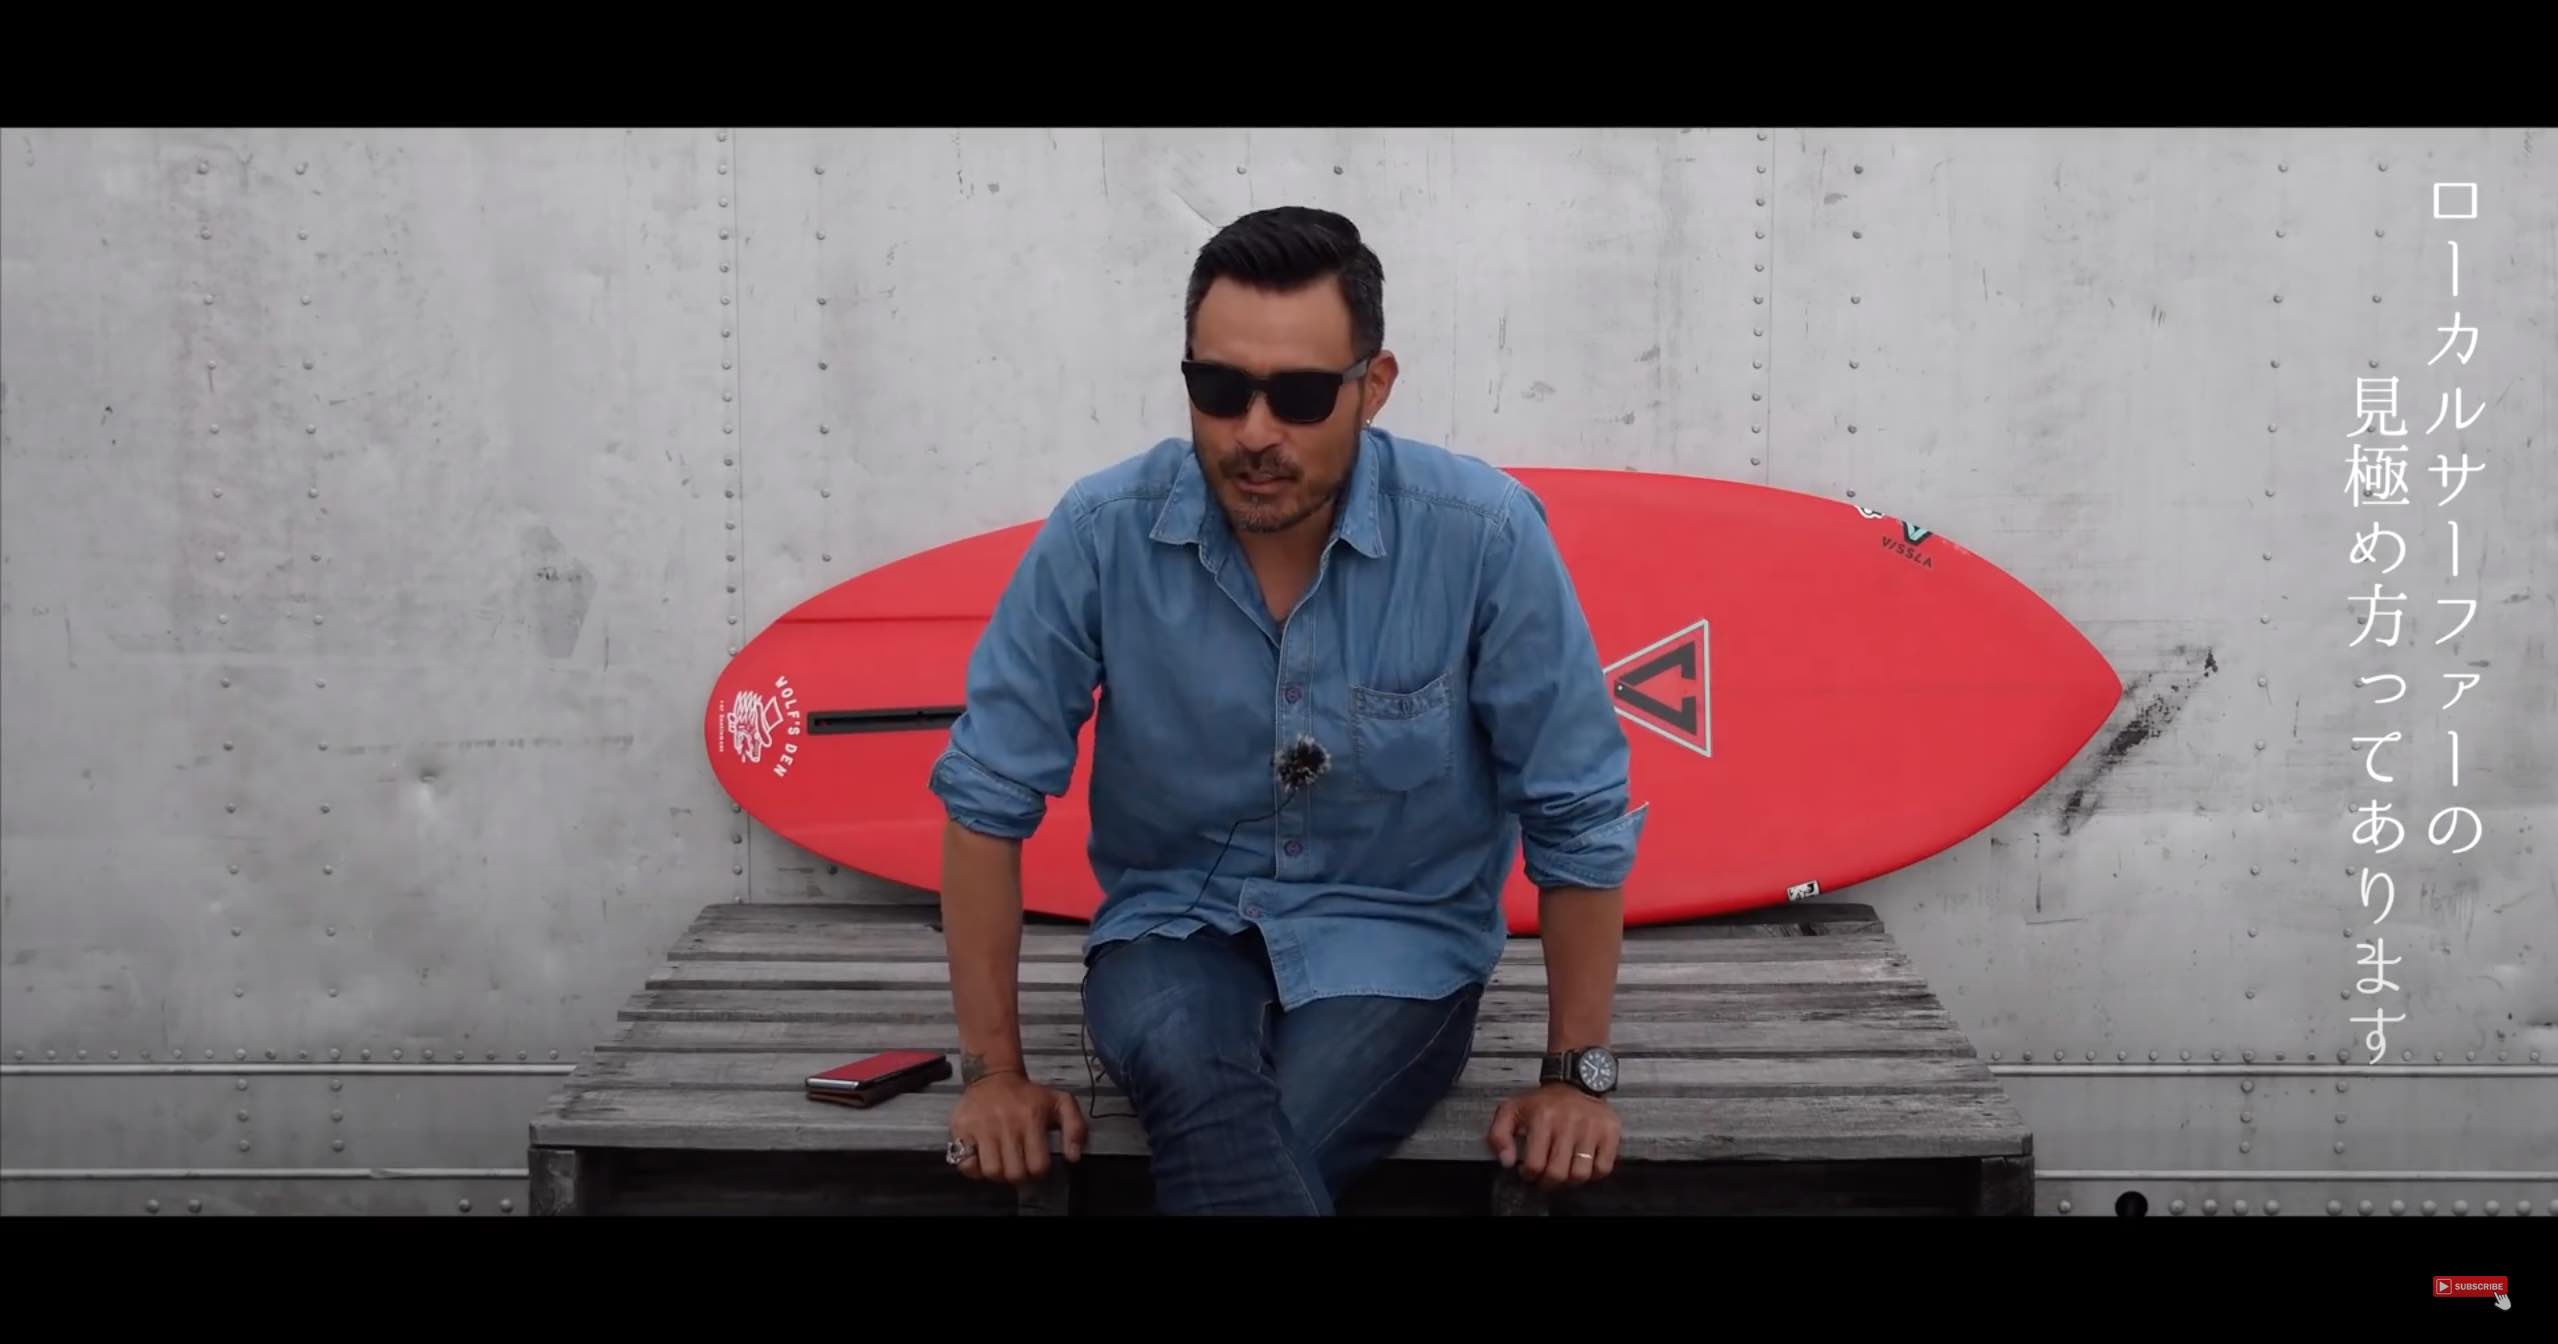 "【SURFERS RULE】サーフィンをより楽しむための貴重なヒントが満載! サーフィン独特のカルチャー、ローカリズムについてカリスマプロサーファー市東""シゲ""重明が語る!"